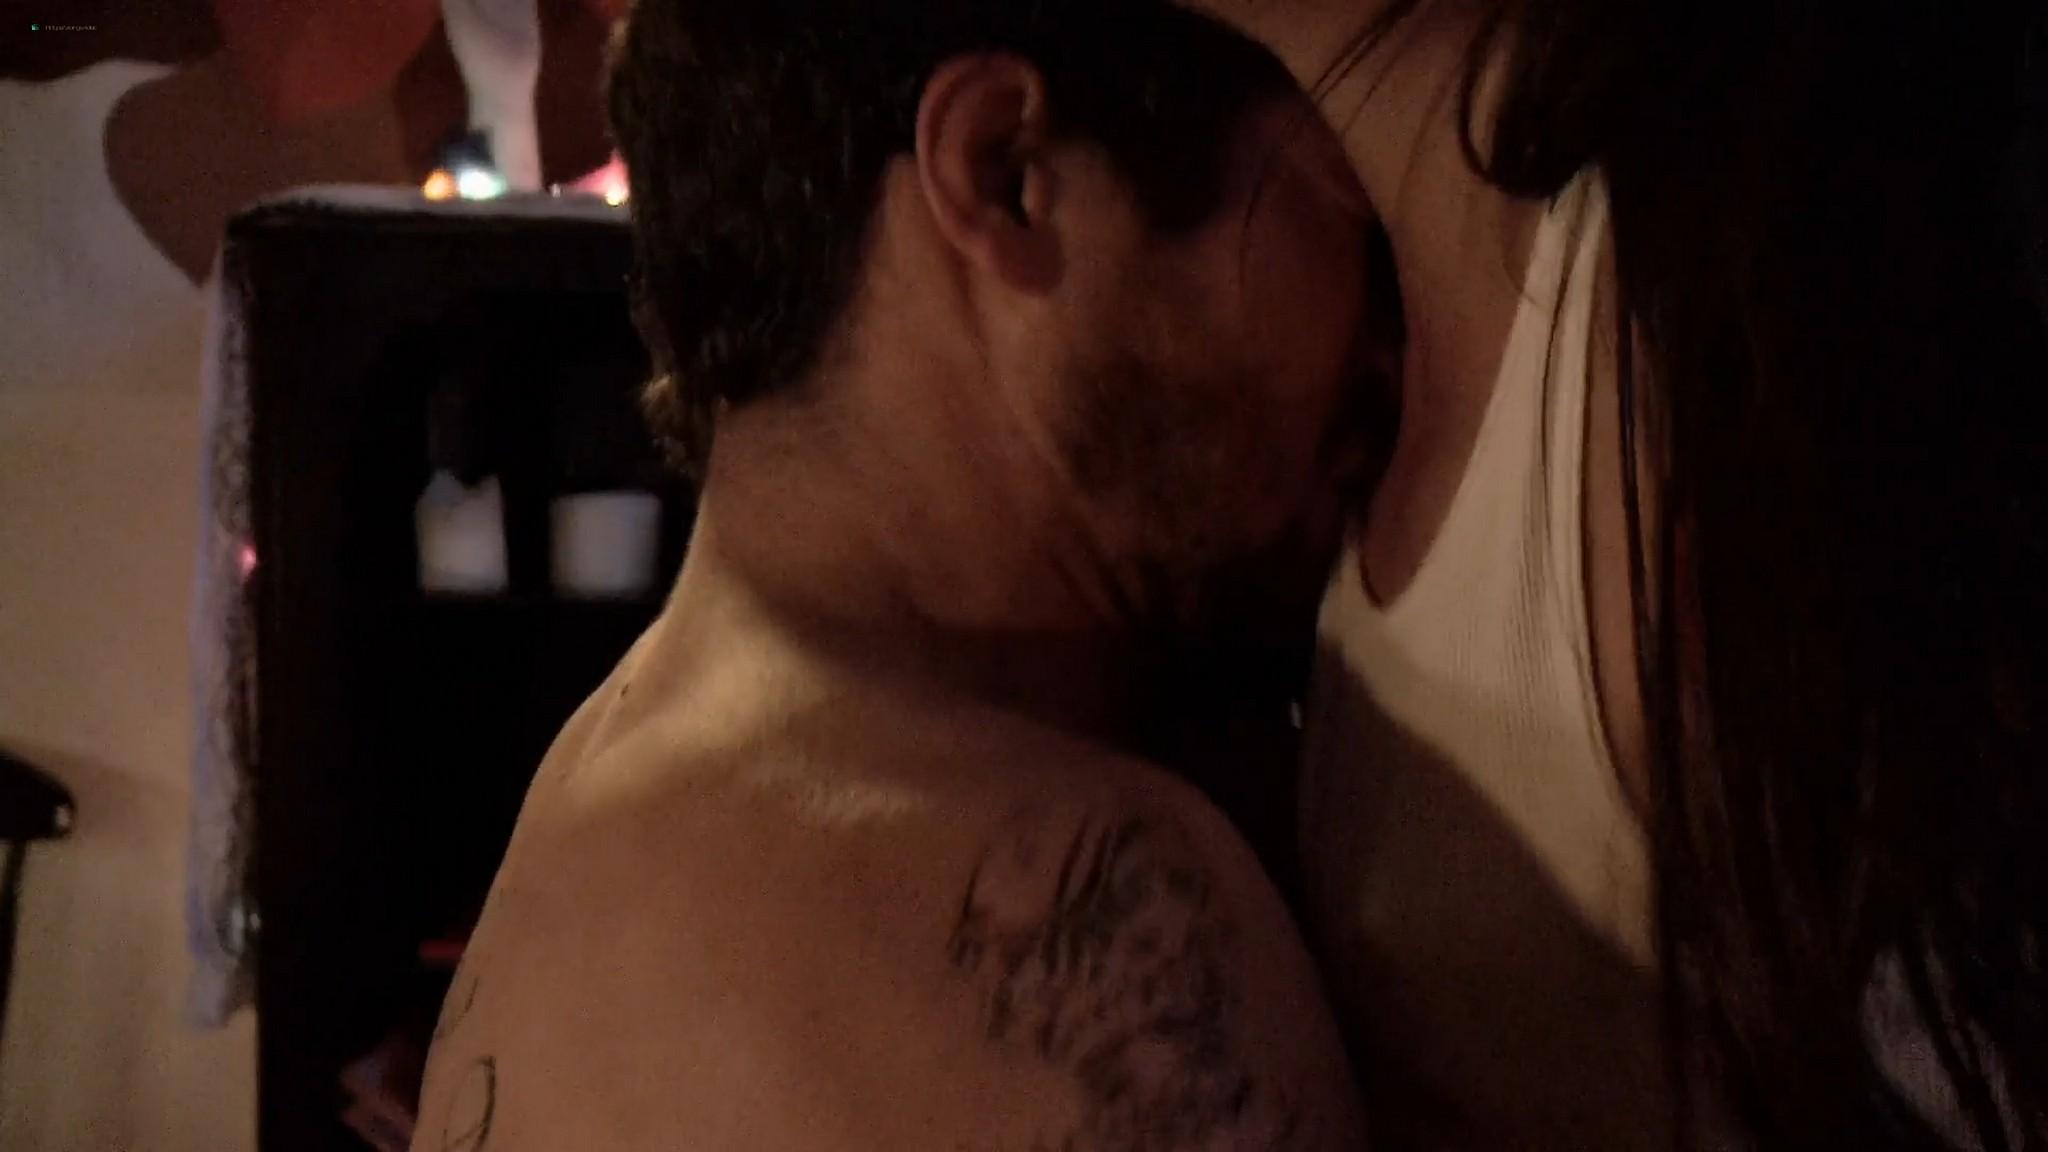 Taylor Cole hot sex Tiffany Shepis Francesca Brandelius naked The Violent Kind 2010 HD 1080p BluRay 001